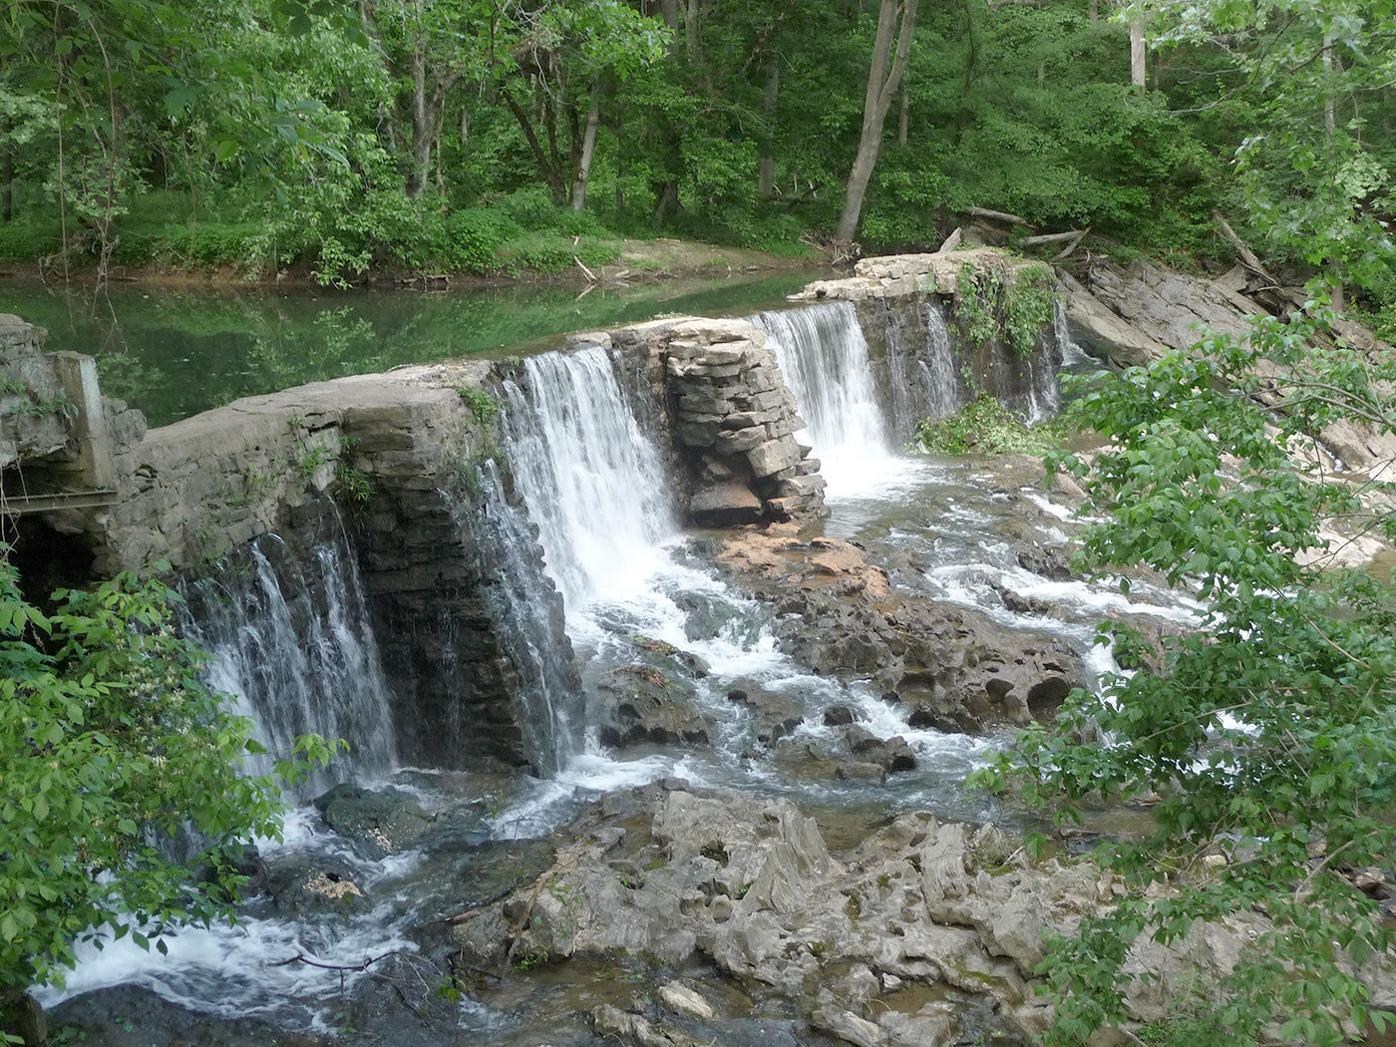 Historic Amis Mill Dam, ca. 1781